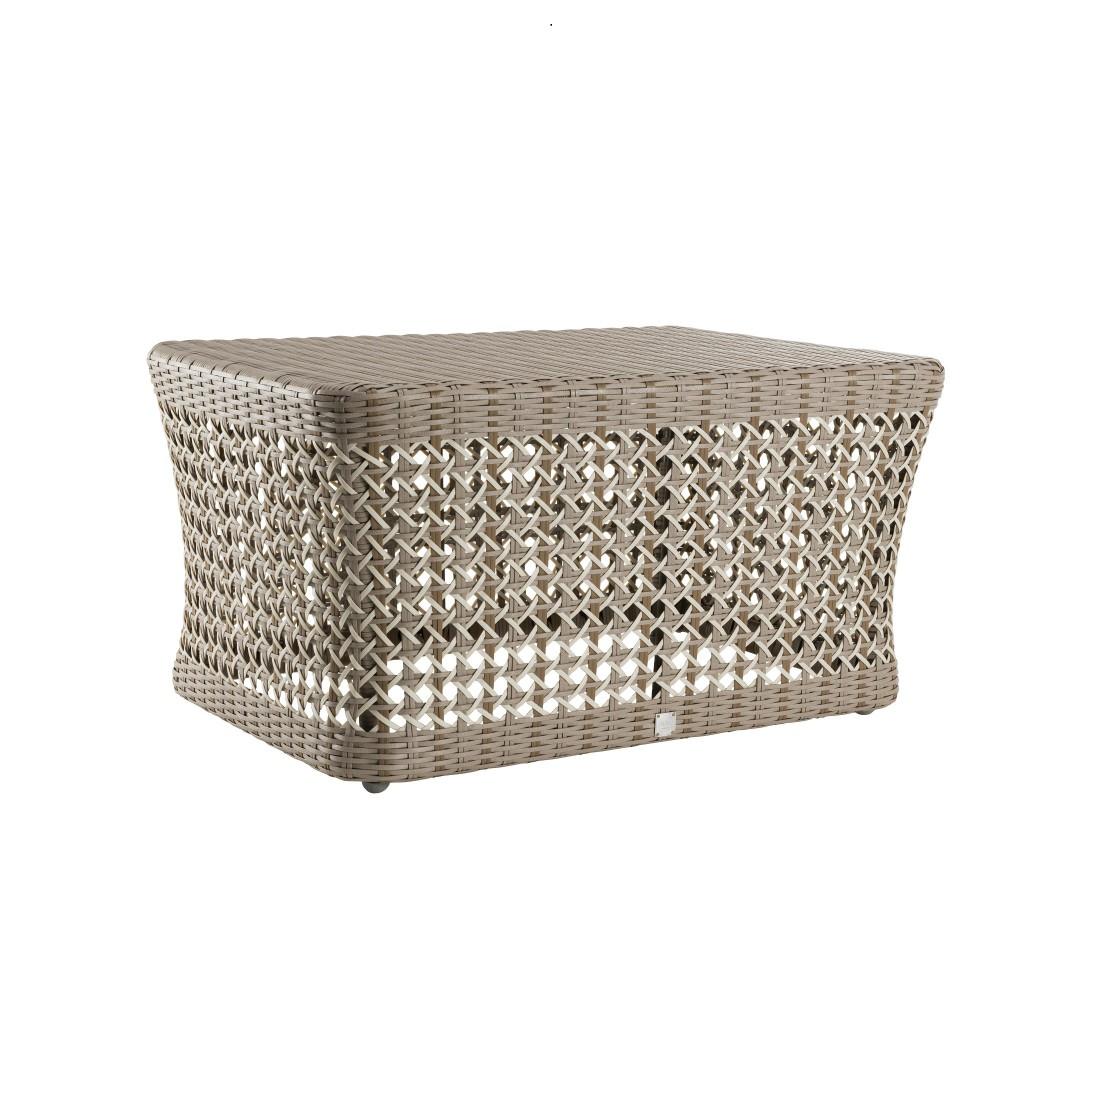 Table basse rectangulaire en r sine antibes salon de jardin - Table basse en resine ...